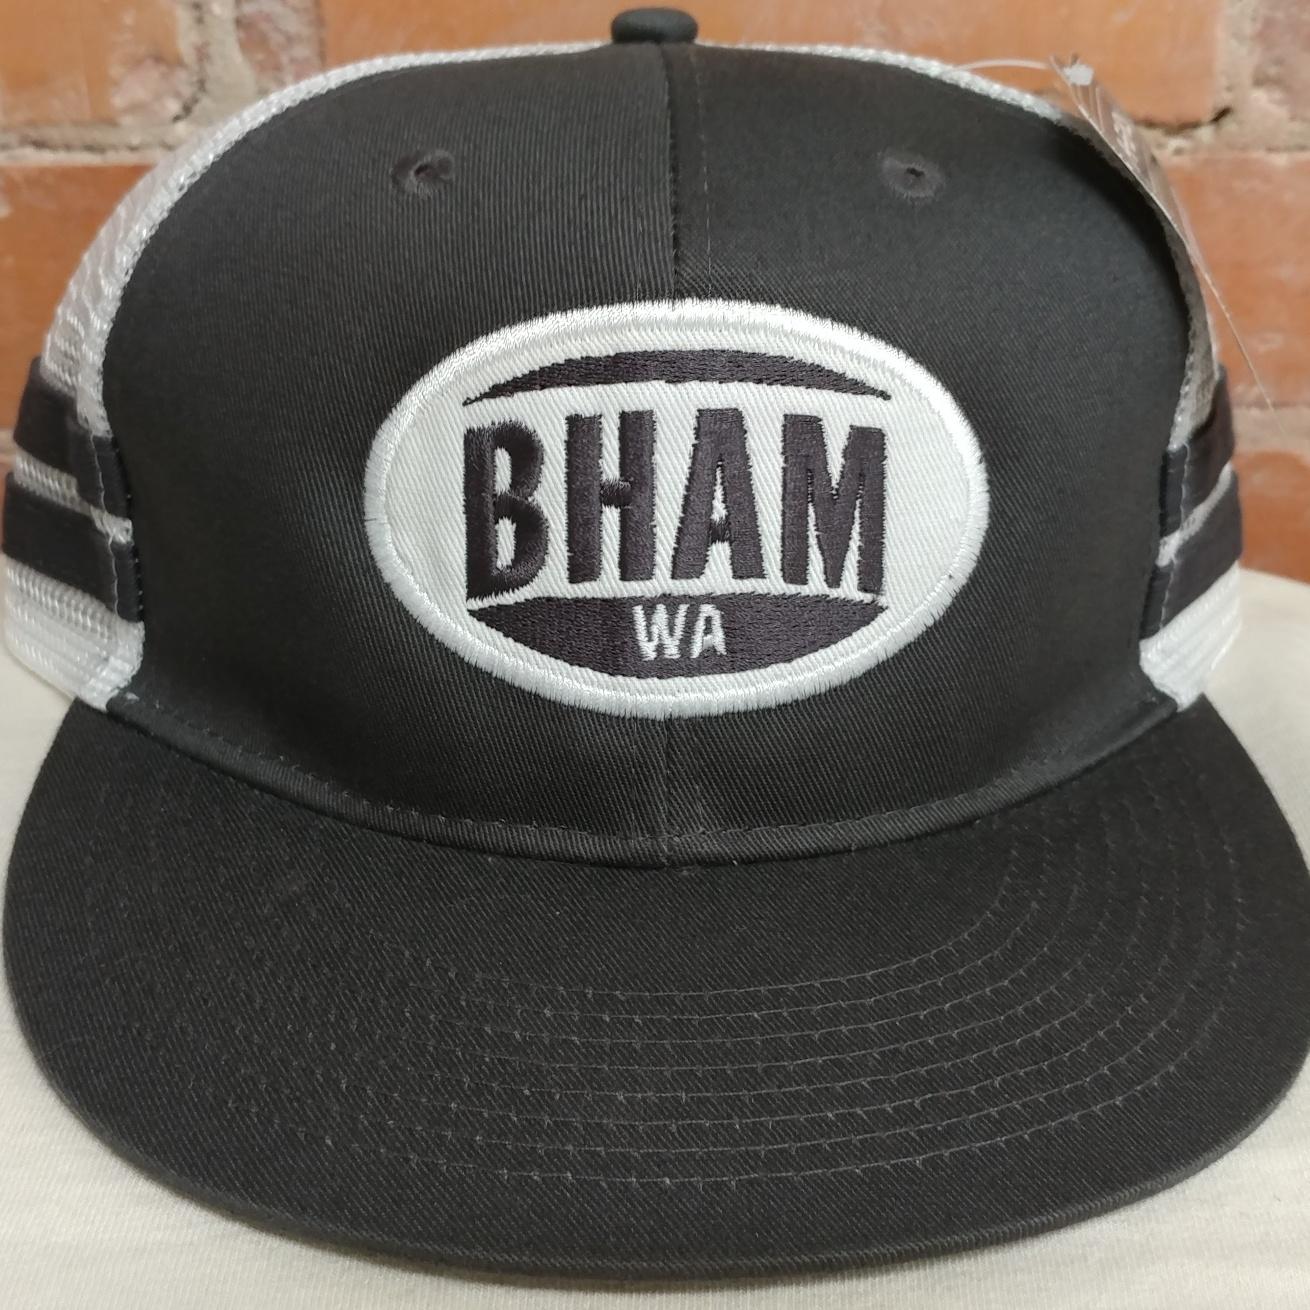 BHAM Grey White